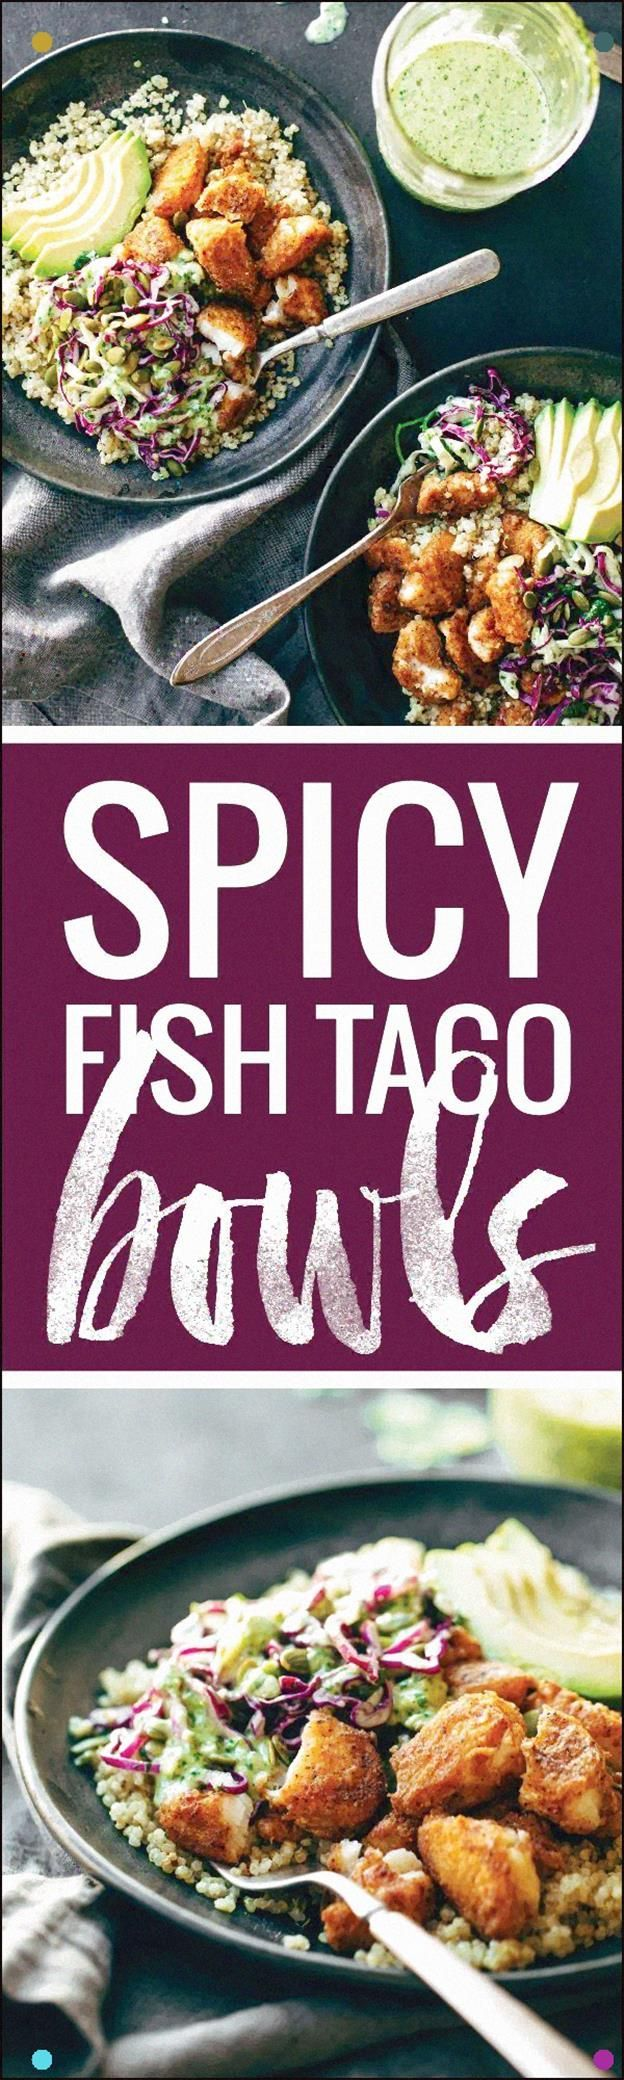 Spicy Fish Taco Bowls With Cilantro Lime Slaw - Crispy, Fresh, And So Yummy Quinoa, Slaw, Avocado, And Crispy Fish #cilantrolimeslaw Spicy Fish Taco Bowls With Cilantro Lime Slaw - Crispy, Fresh, And So Yummy Quinoa, Slaw, Avocado, And Crispy Fish #cilantrolimeslaw